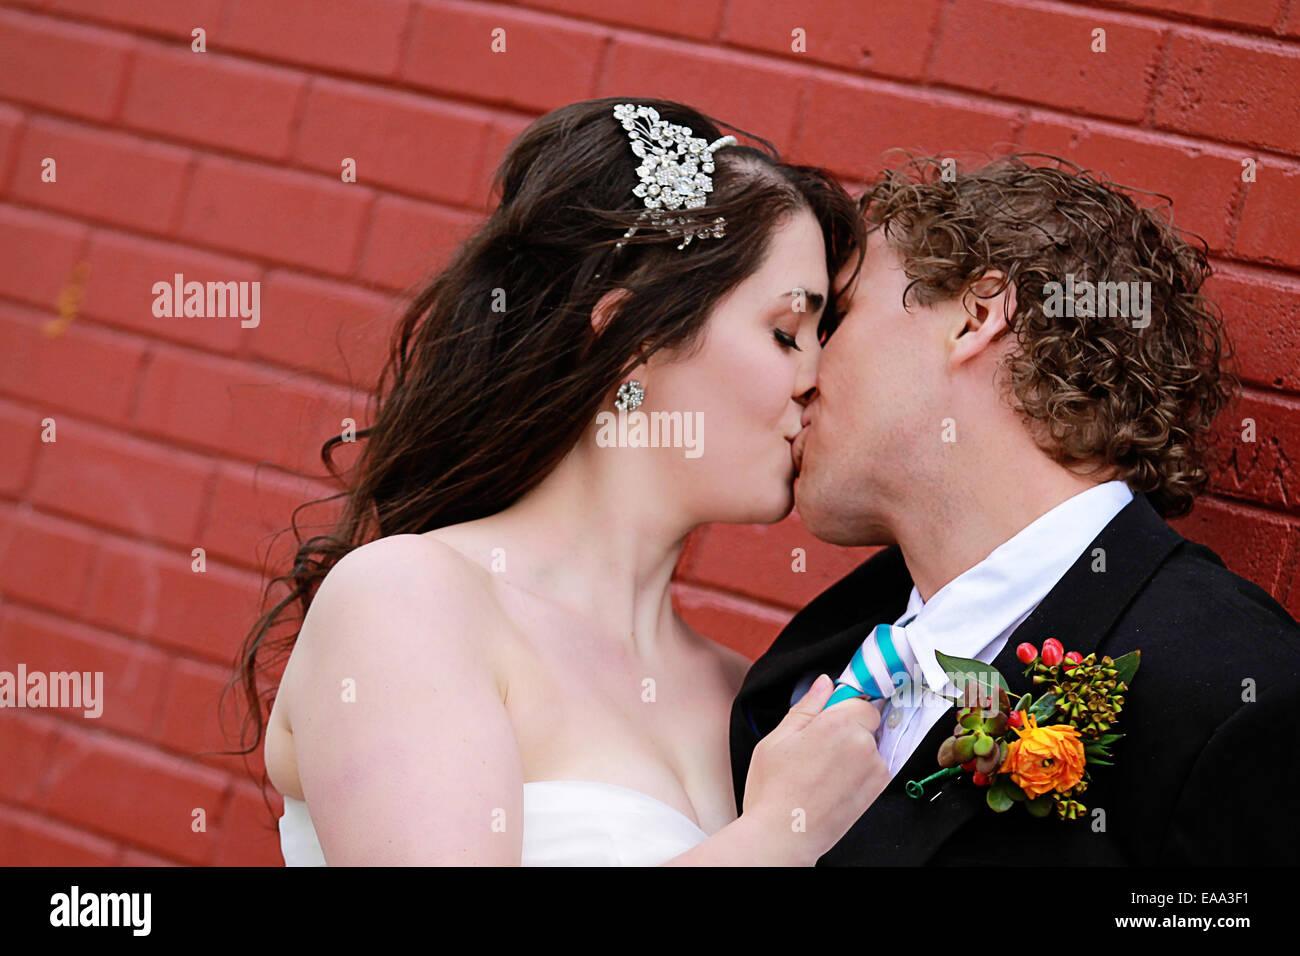 Bride There 29